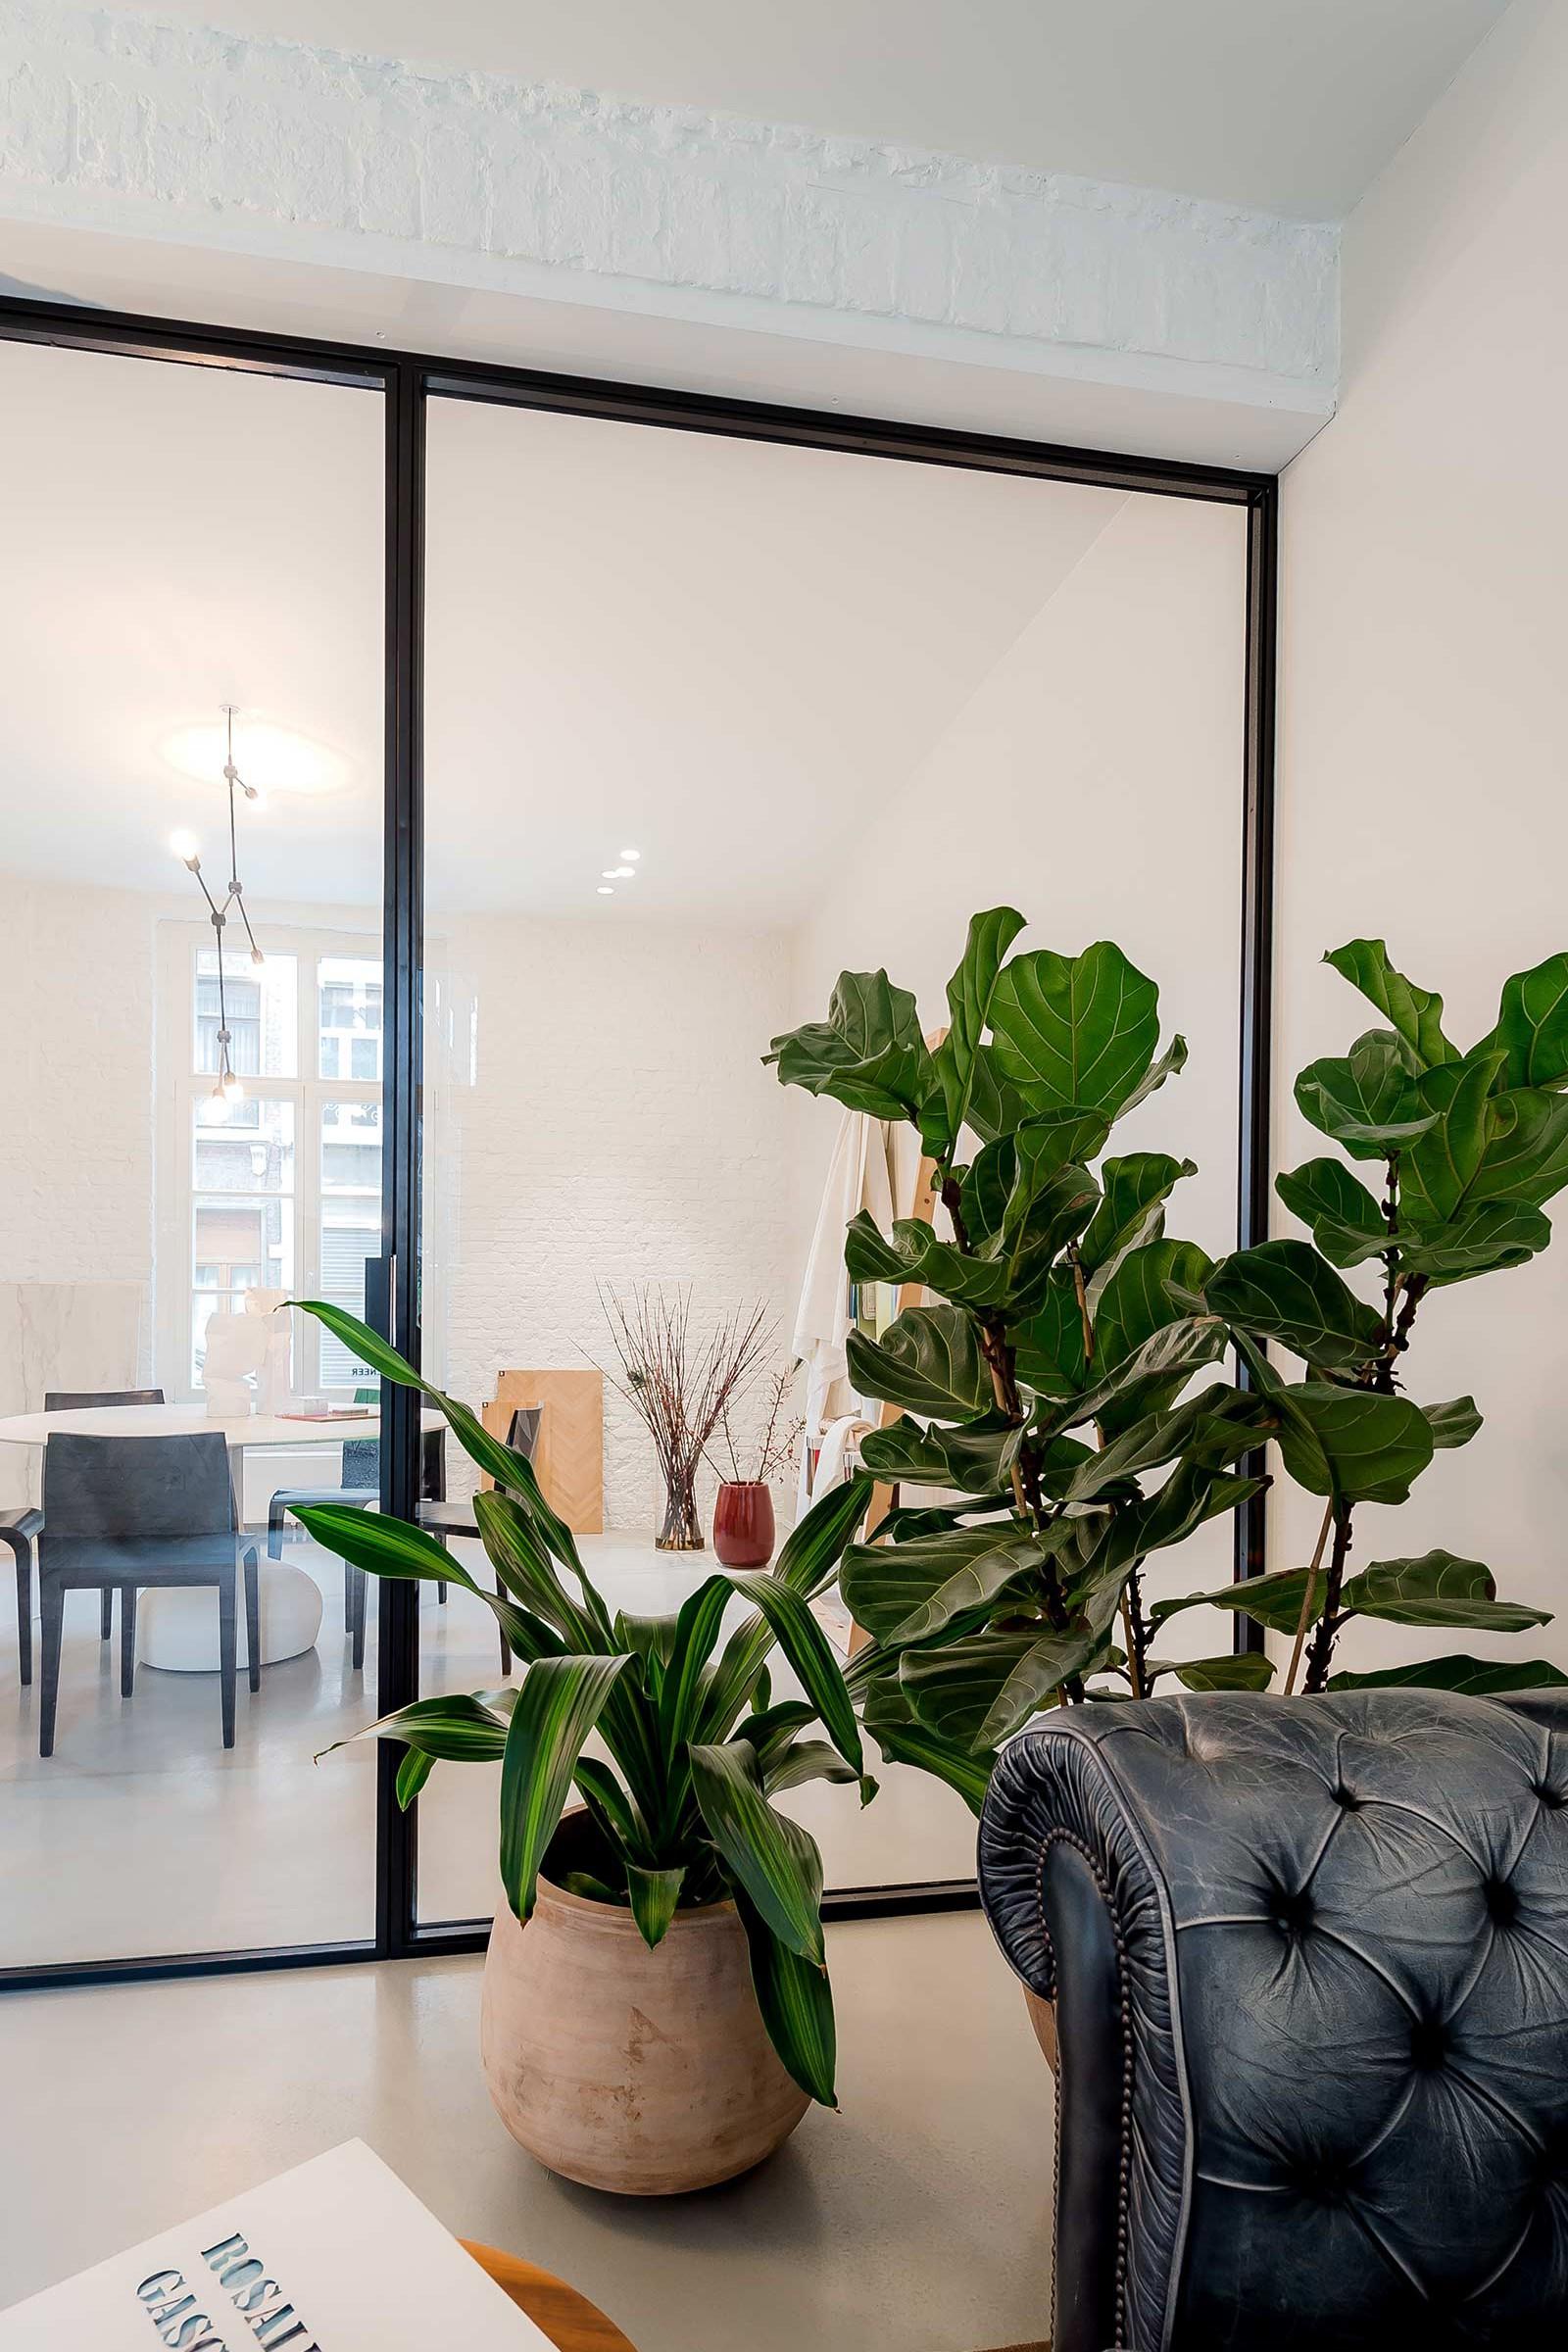 Studio Tolleneer - Office Antwerpen - Rijkswachtkazerne - steel frame stalen frame